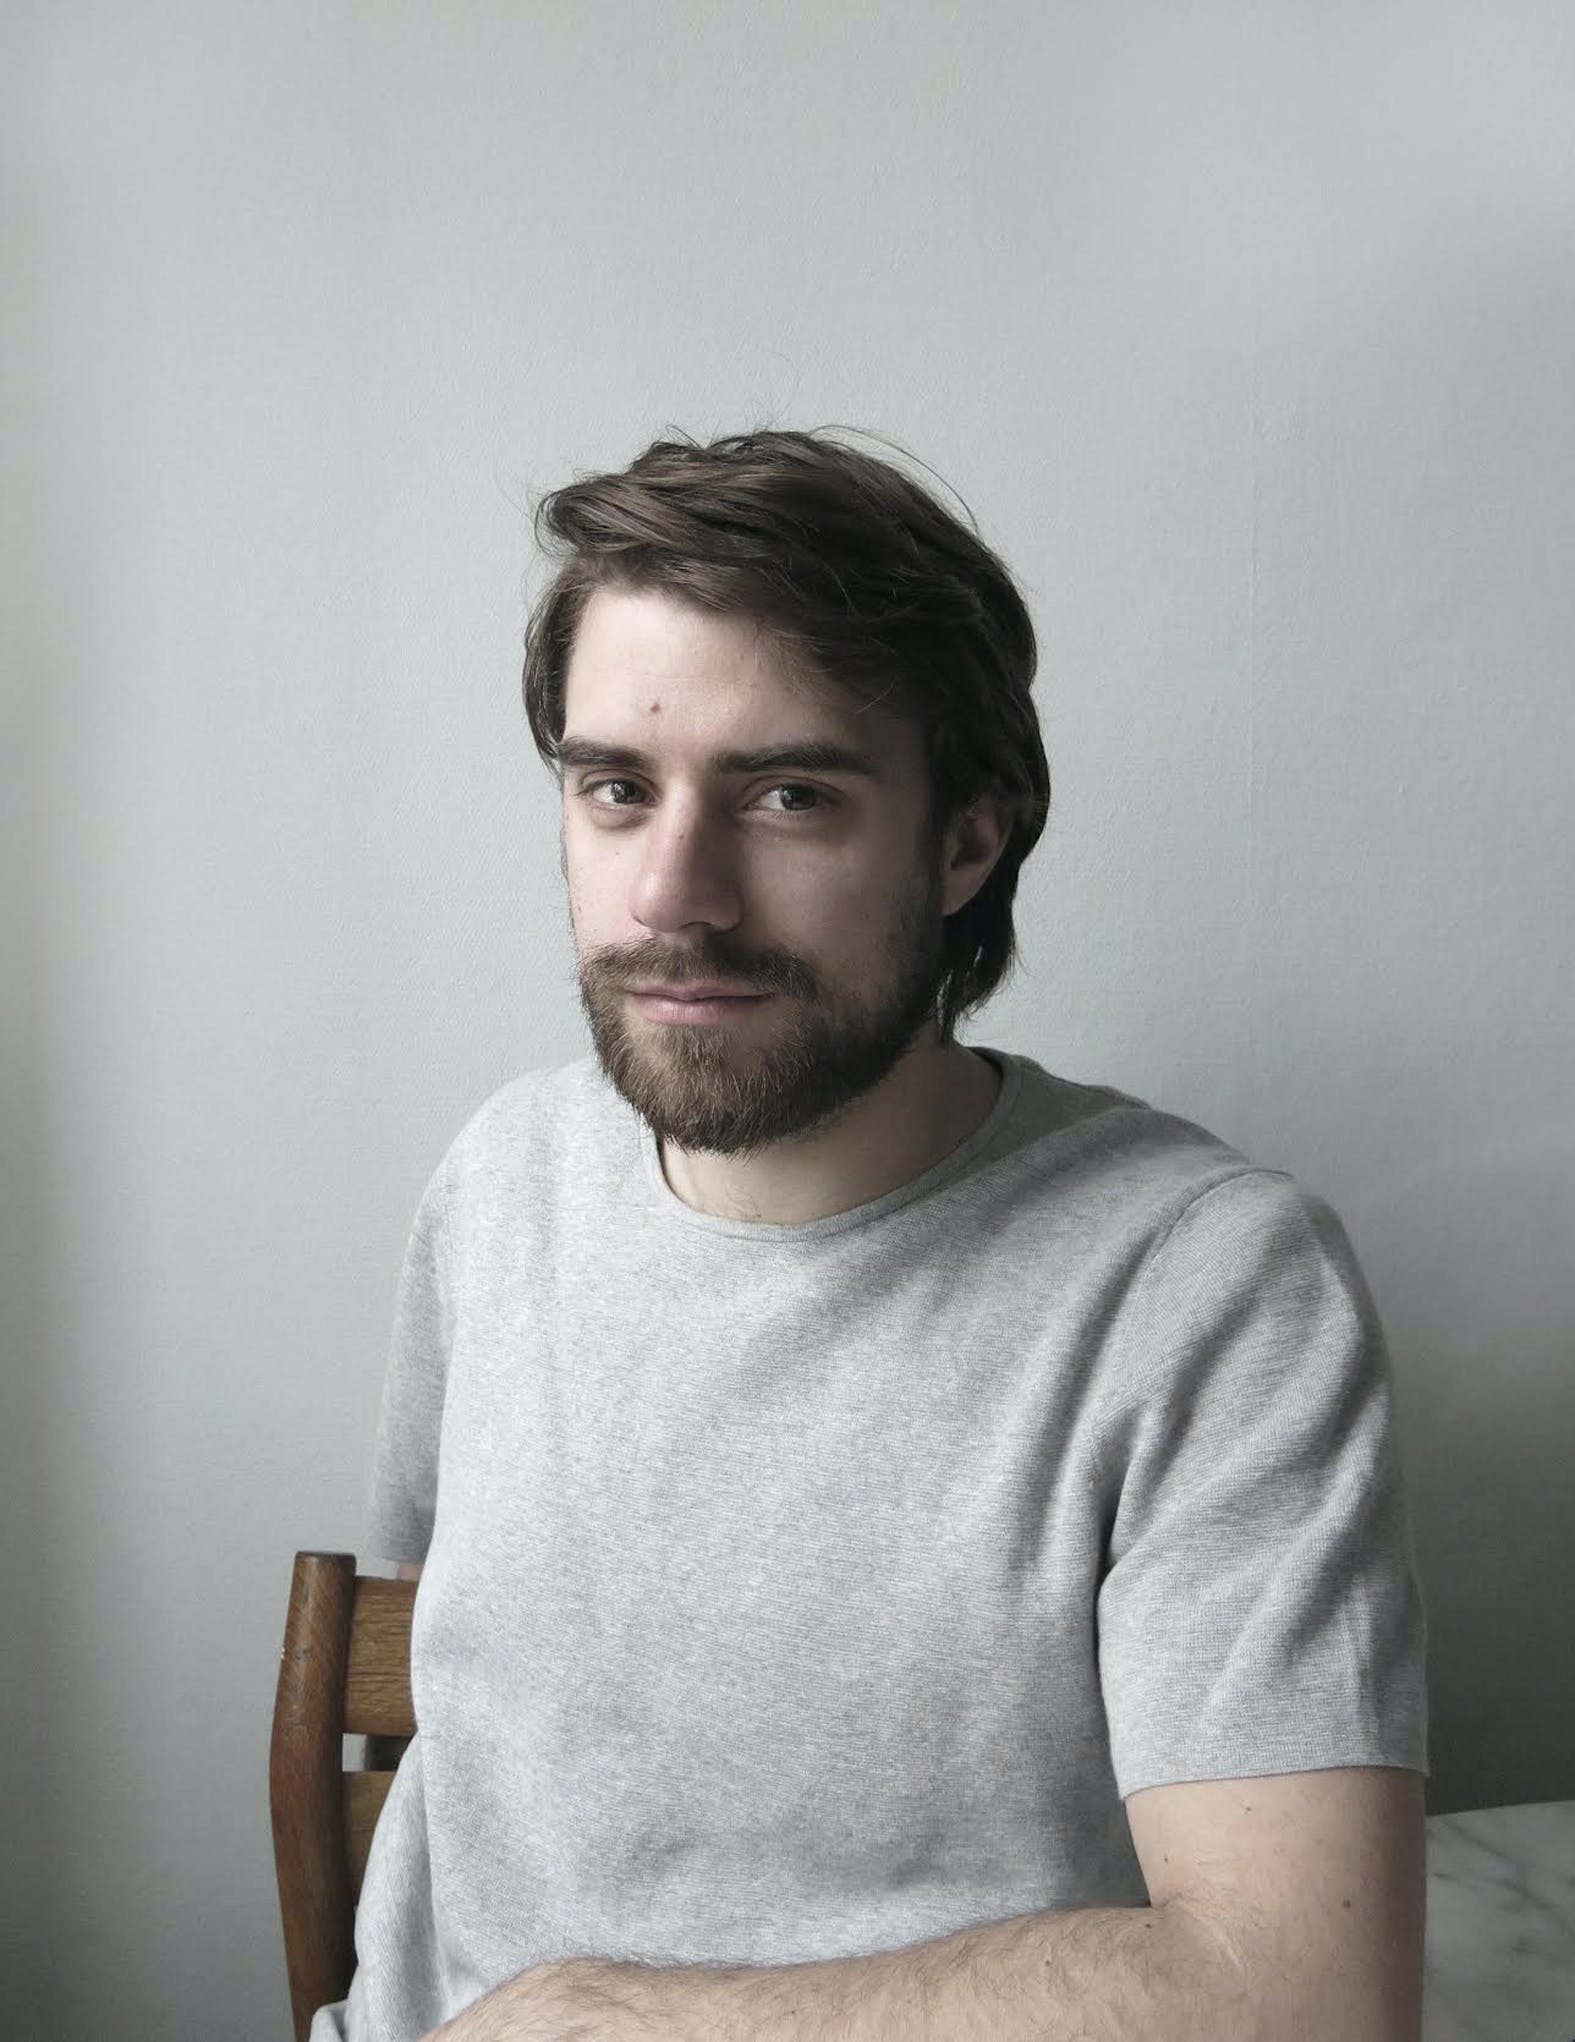 Christian Juhl